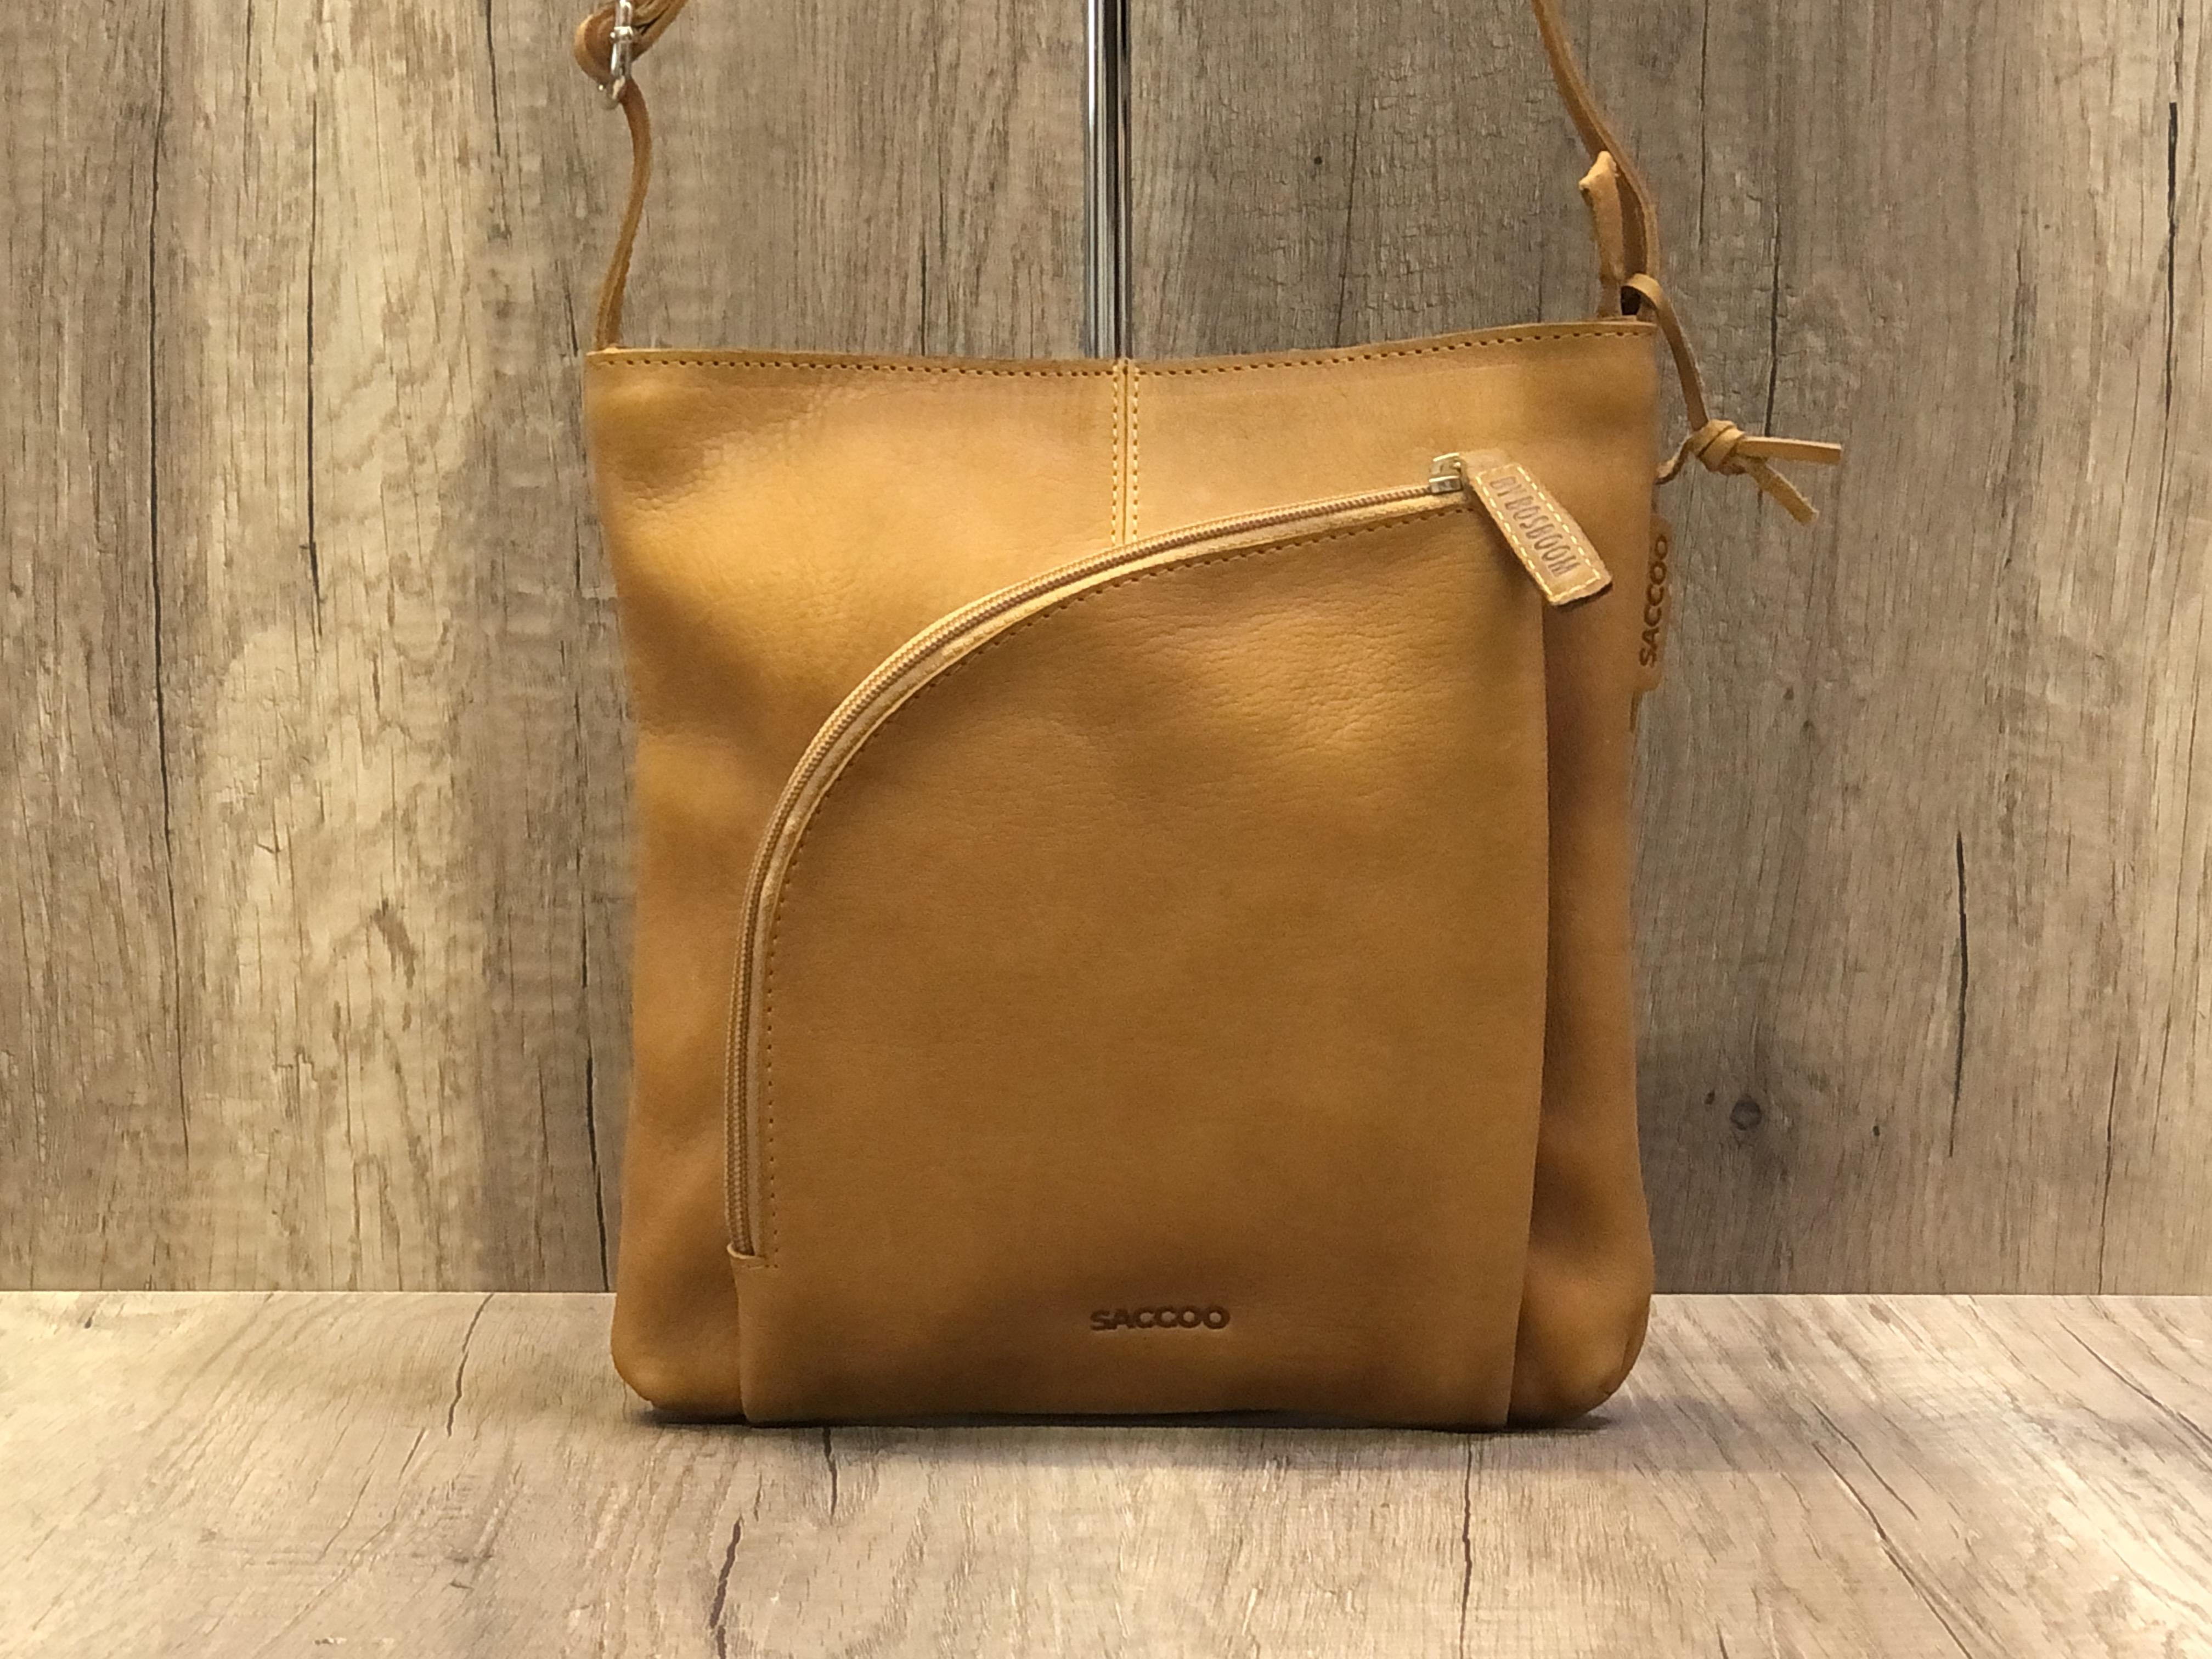 Saccoo-handtassen 8